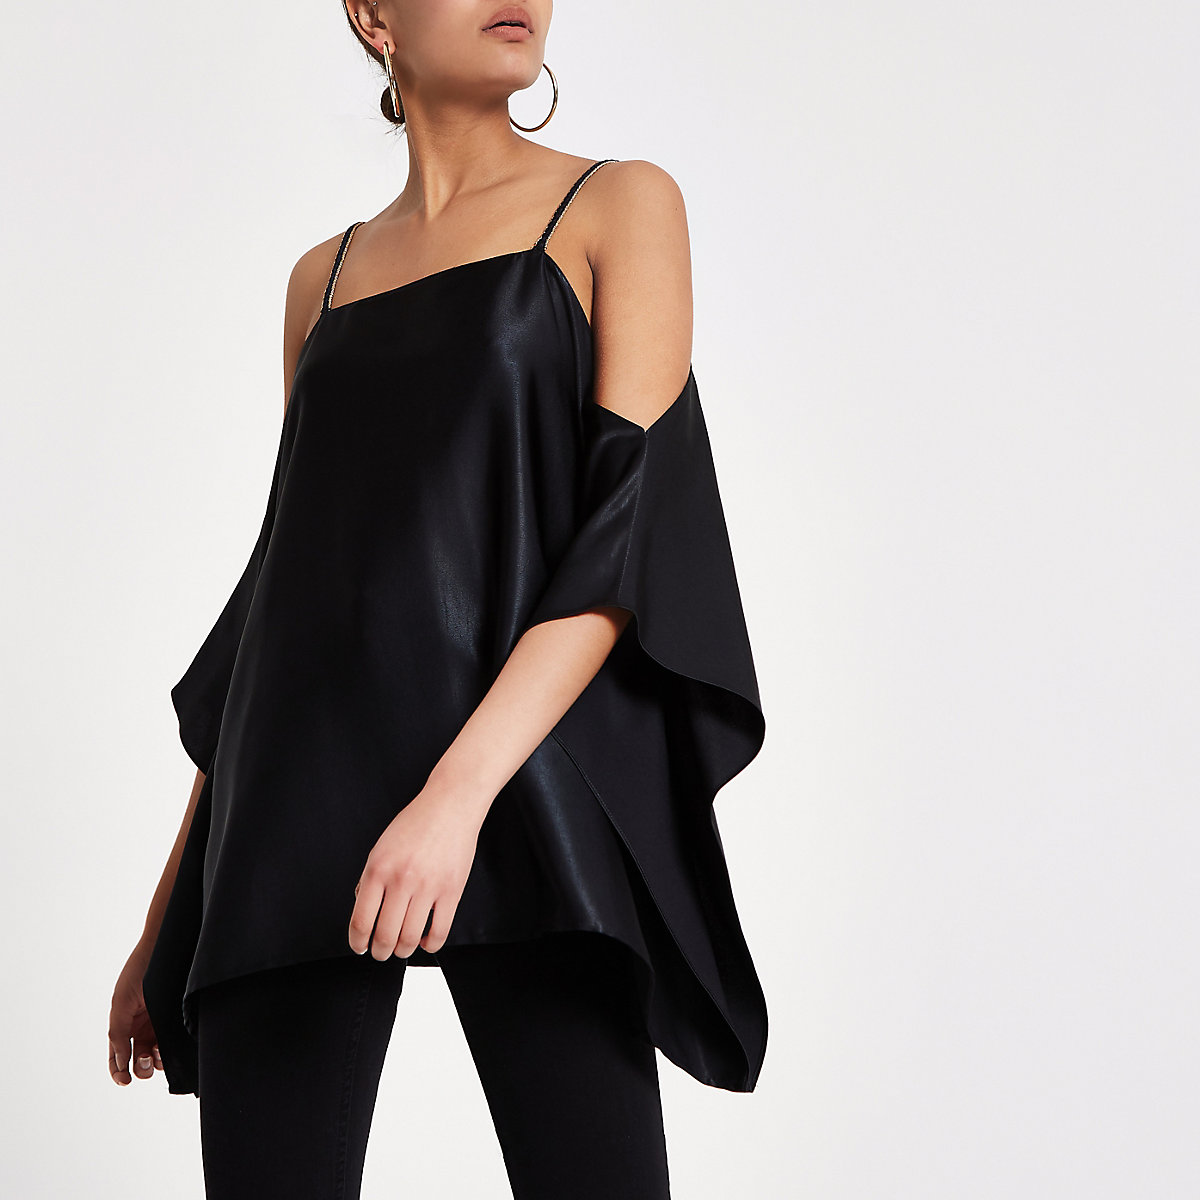 Black satin cold shoulder cami top